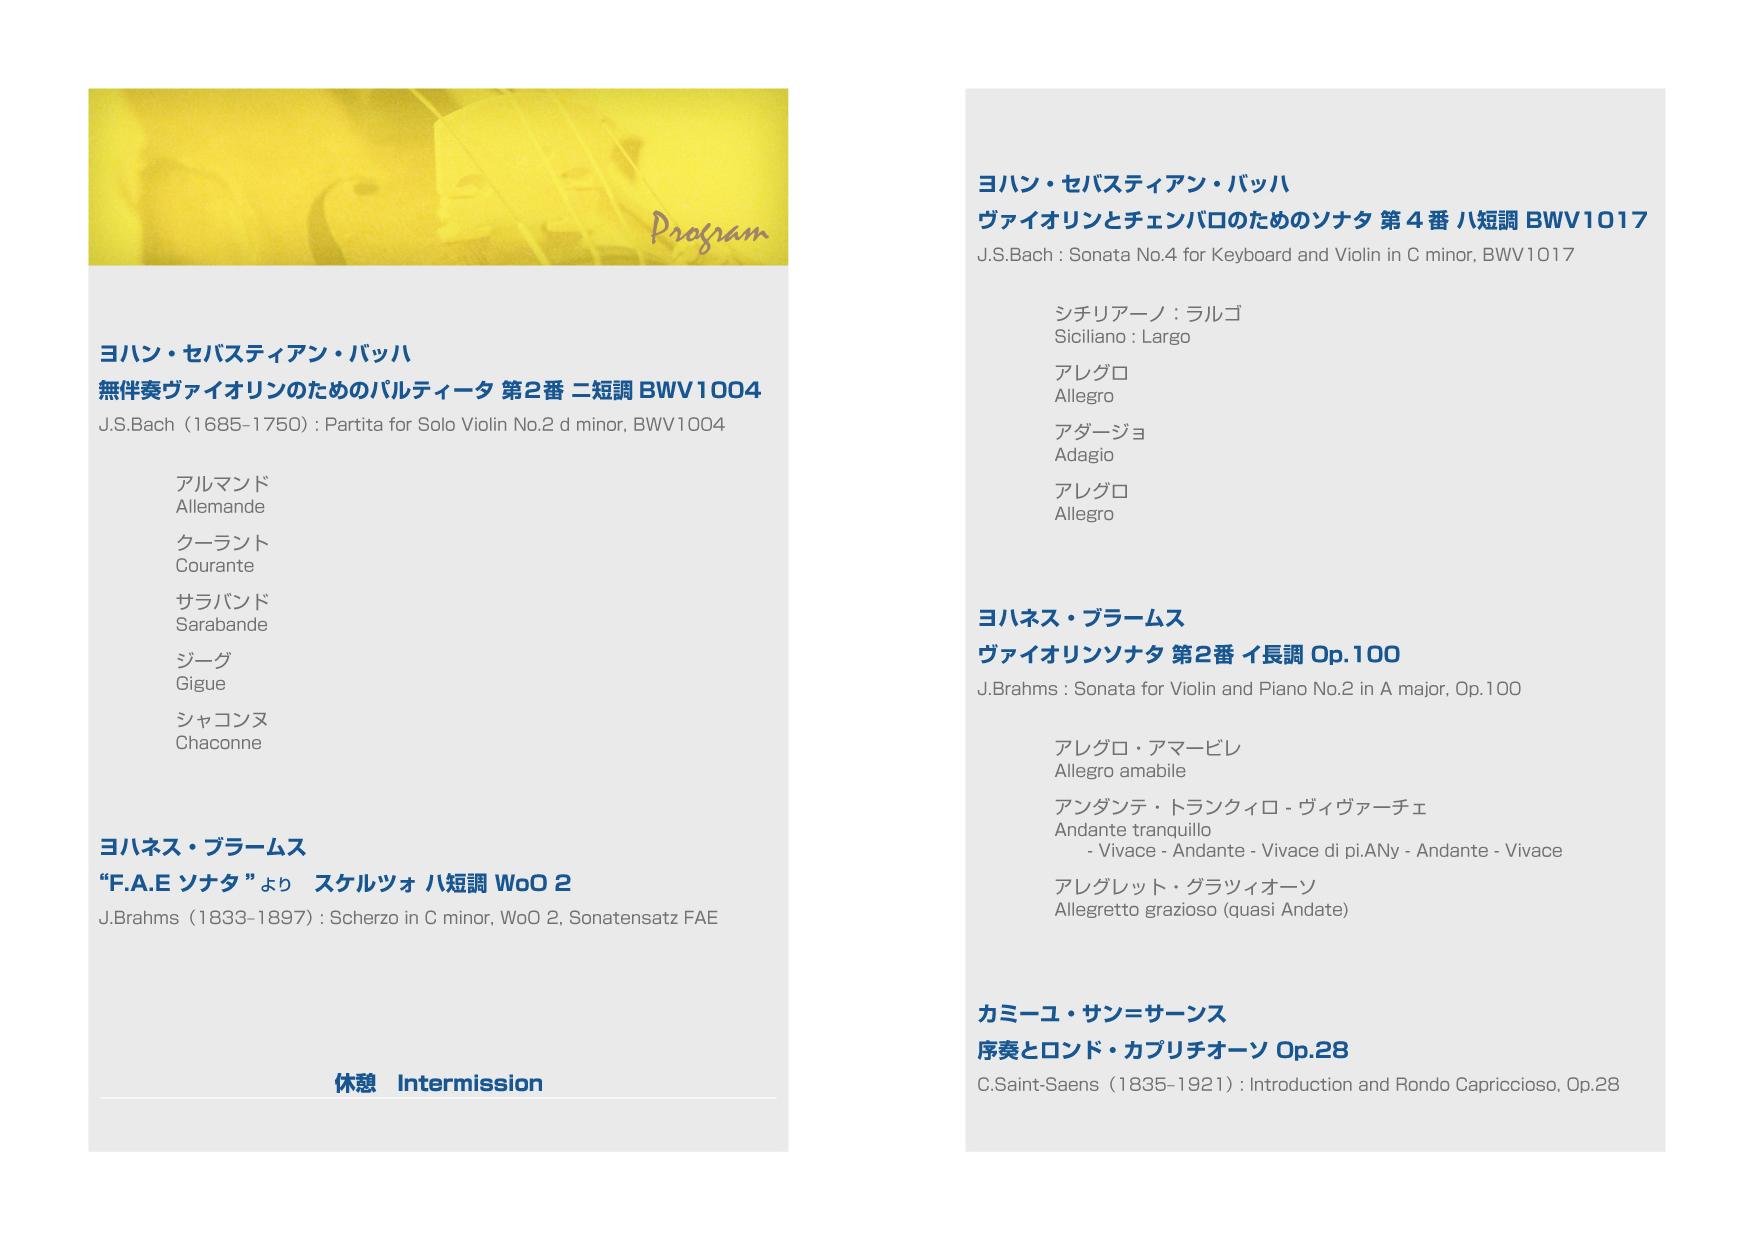 kawashima_p2-3